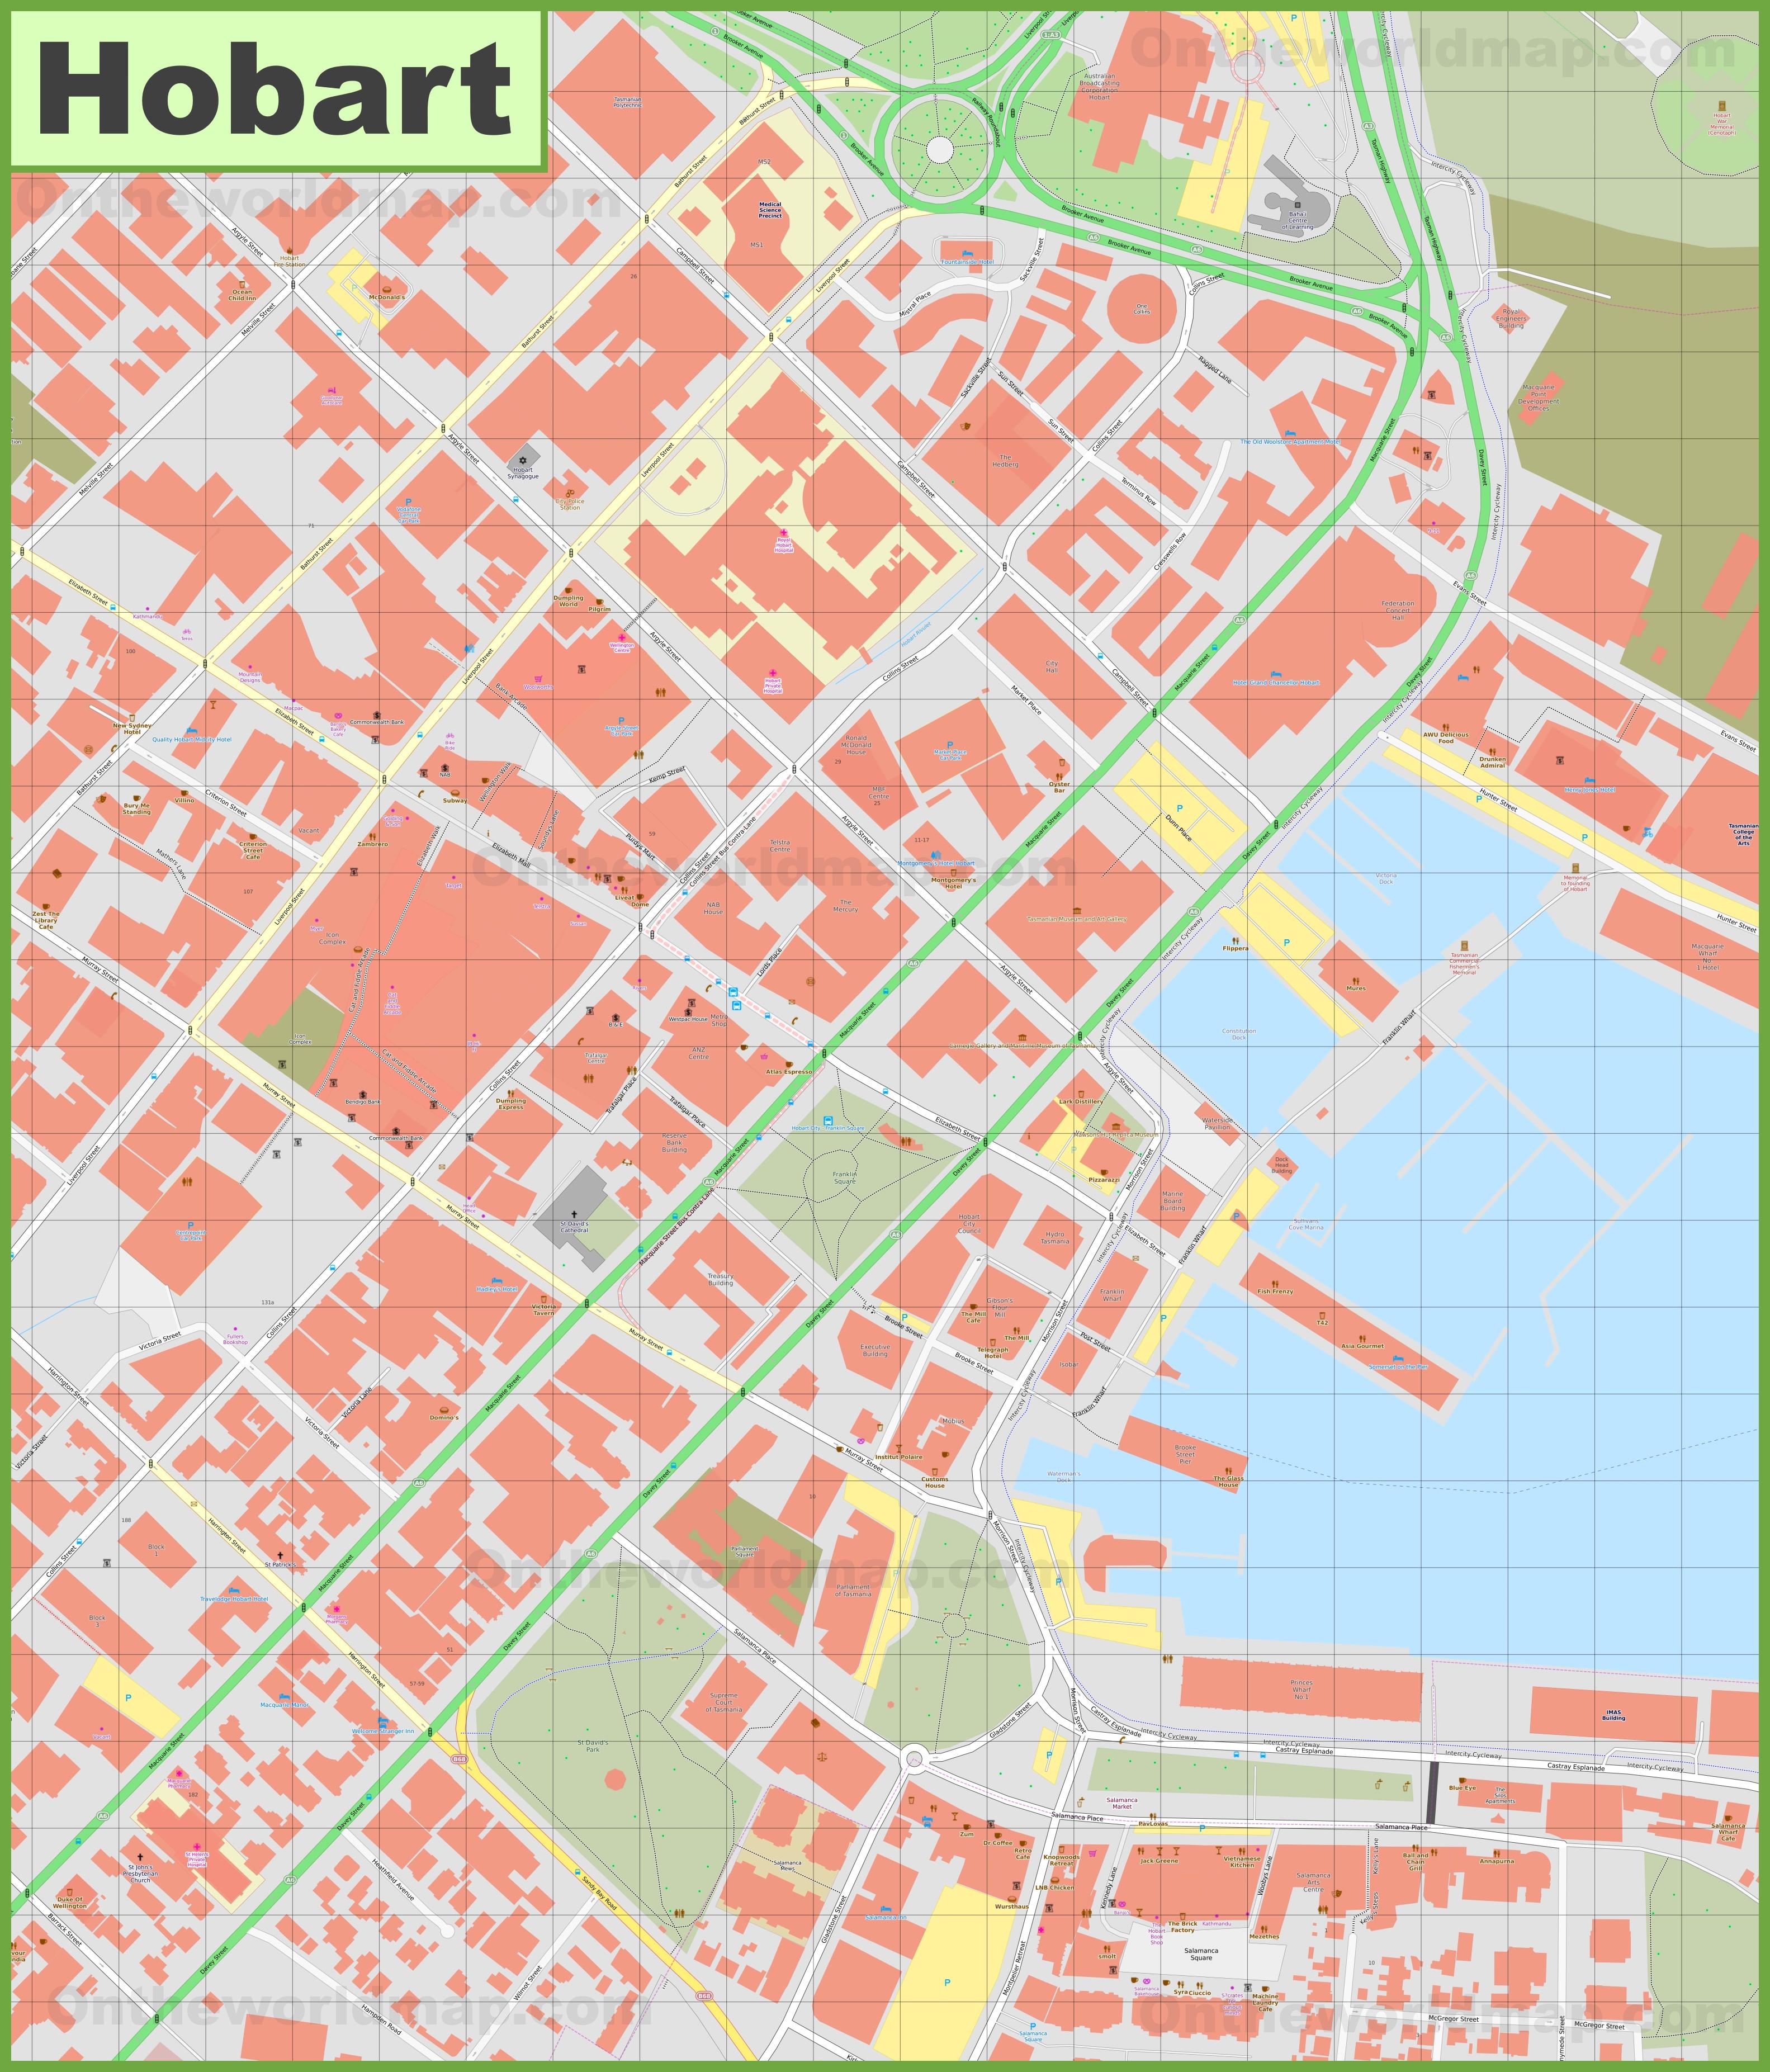 Hobart CBD map